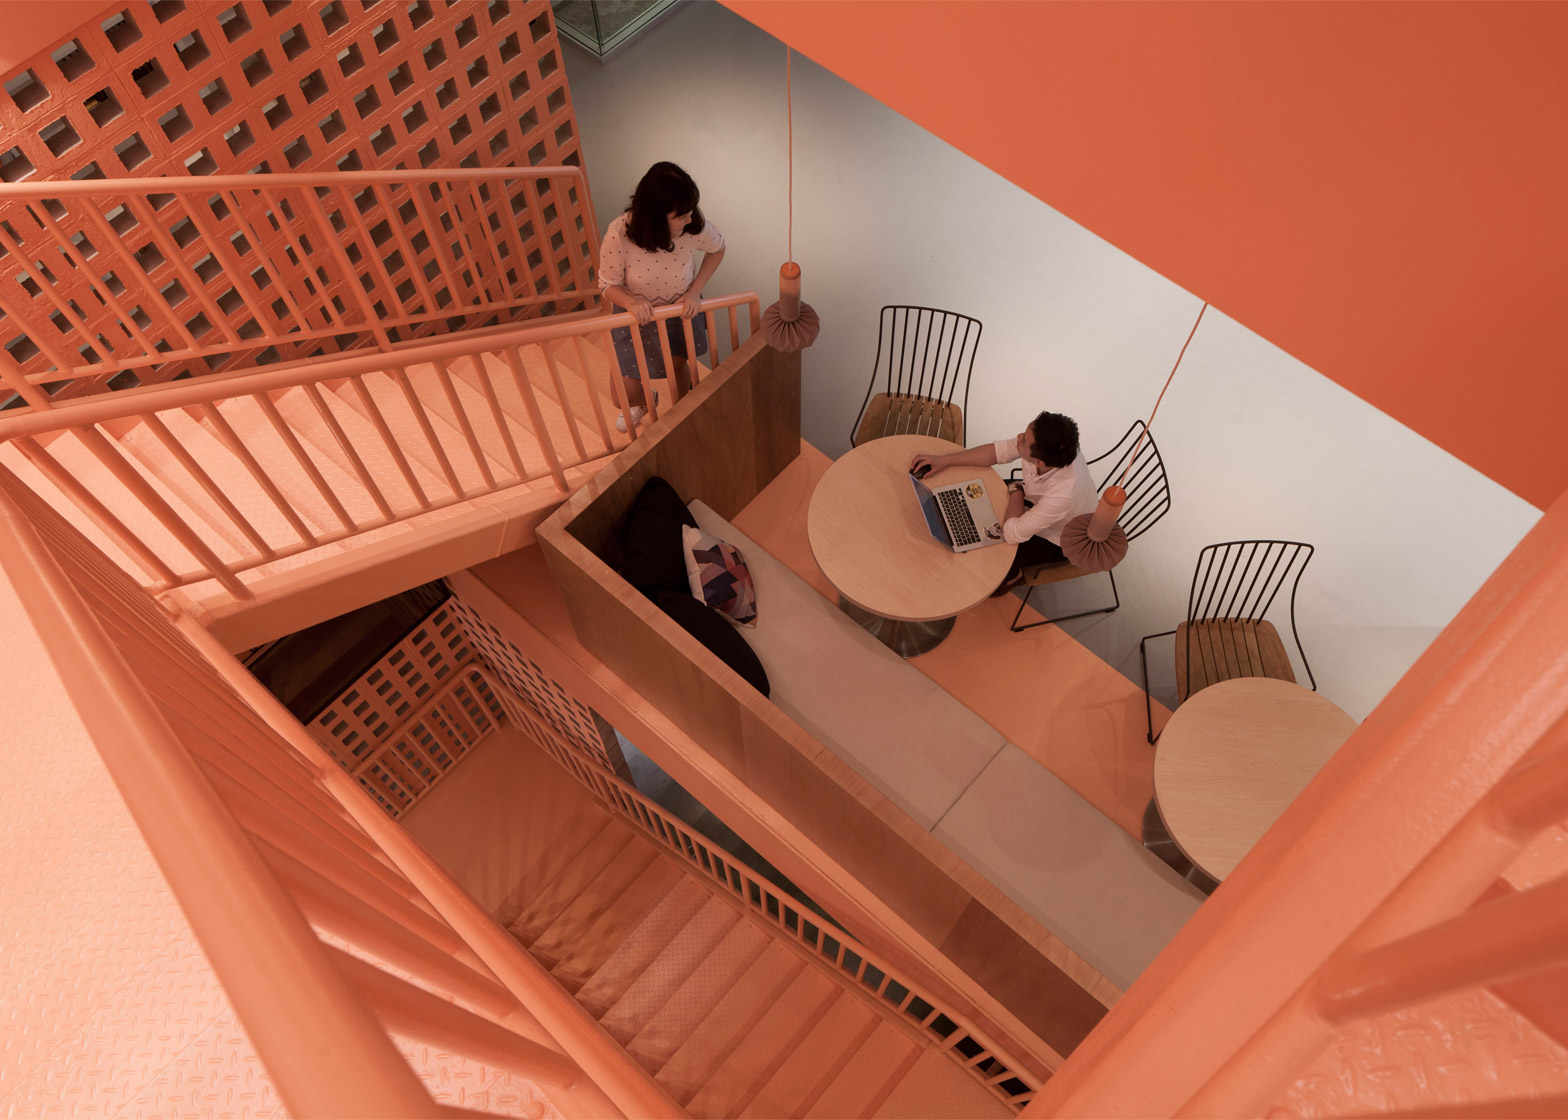 airbnb-offices-singapore-farm_dezeen_1568_1